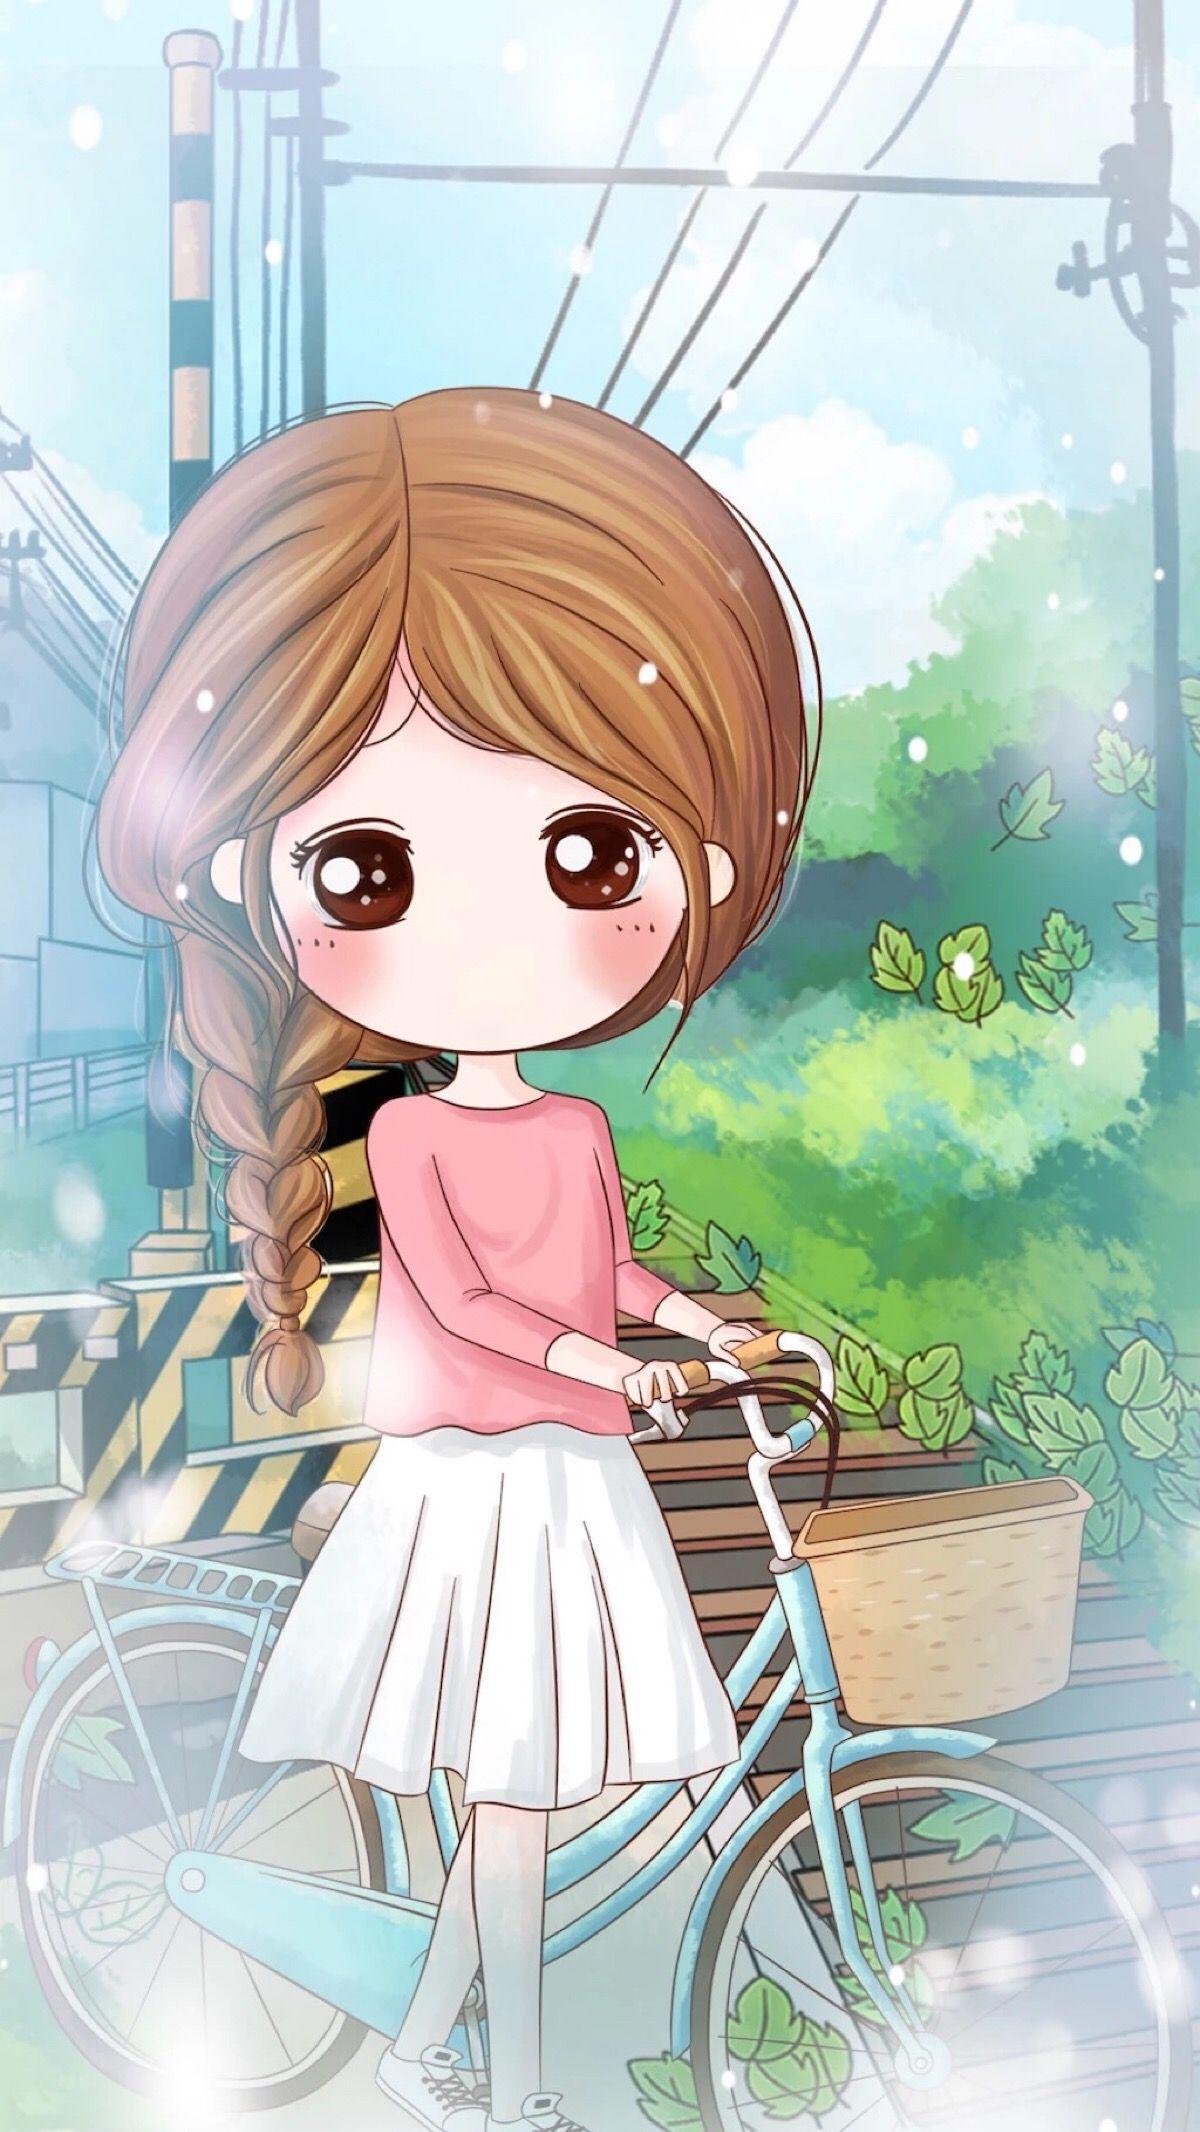 Anime Cute Girl Cartoon Wallpapers - Wallpaper Cave